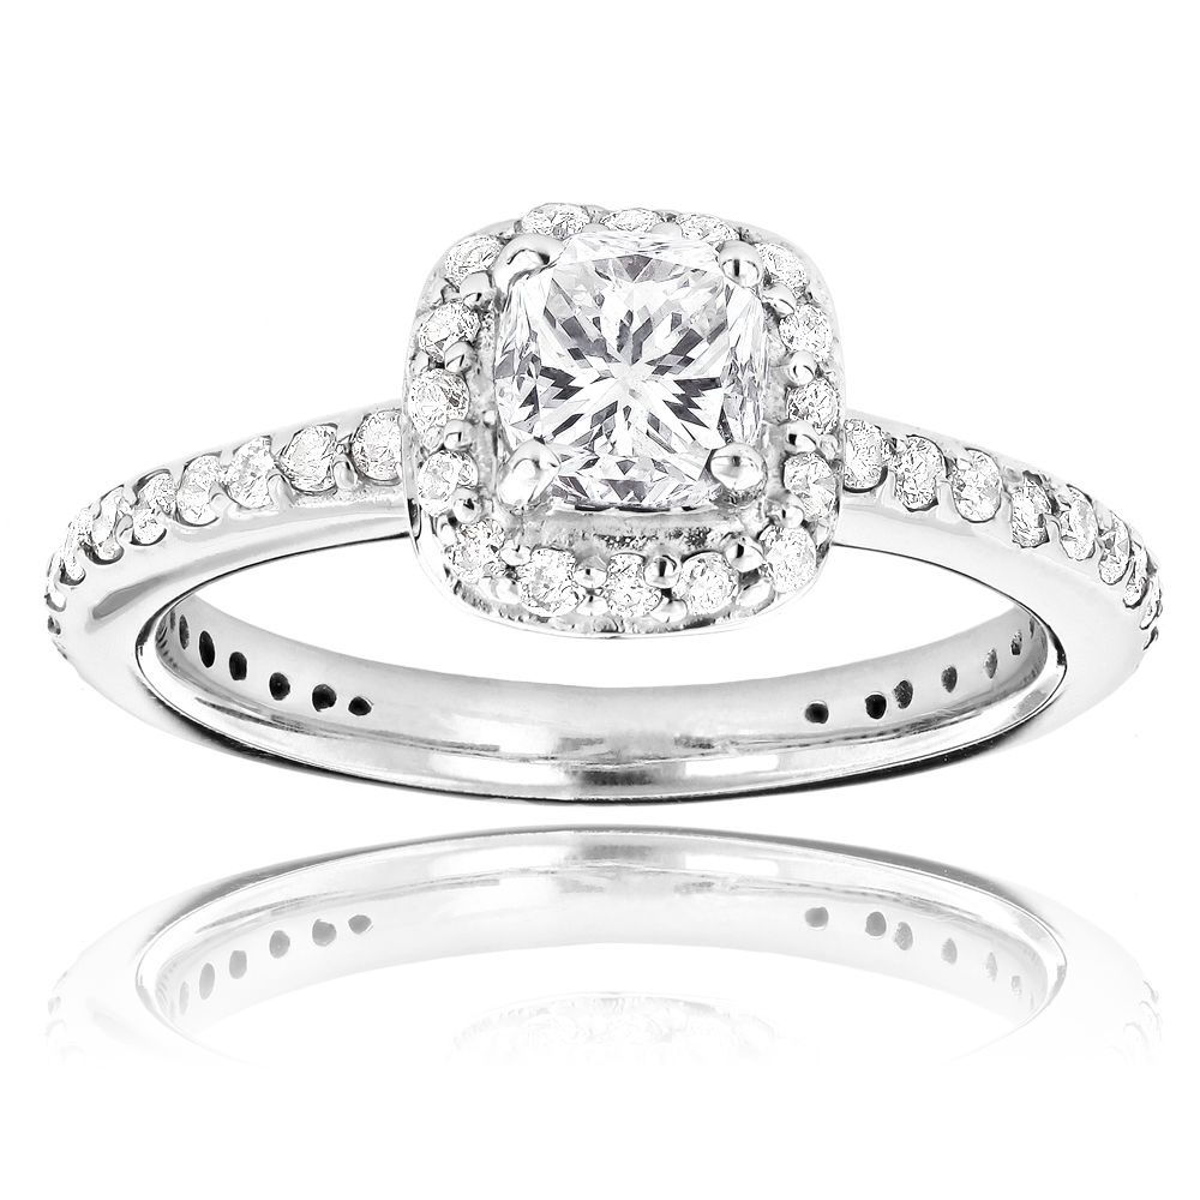 14K Gold Cushion Cut Diamond Unique Engagement Ring 1.22ct Halo Design